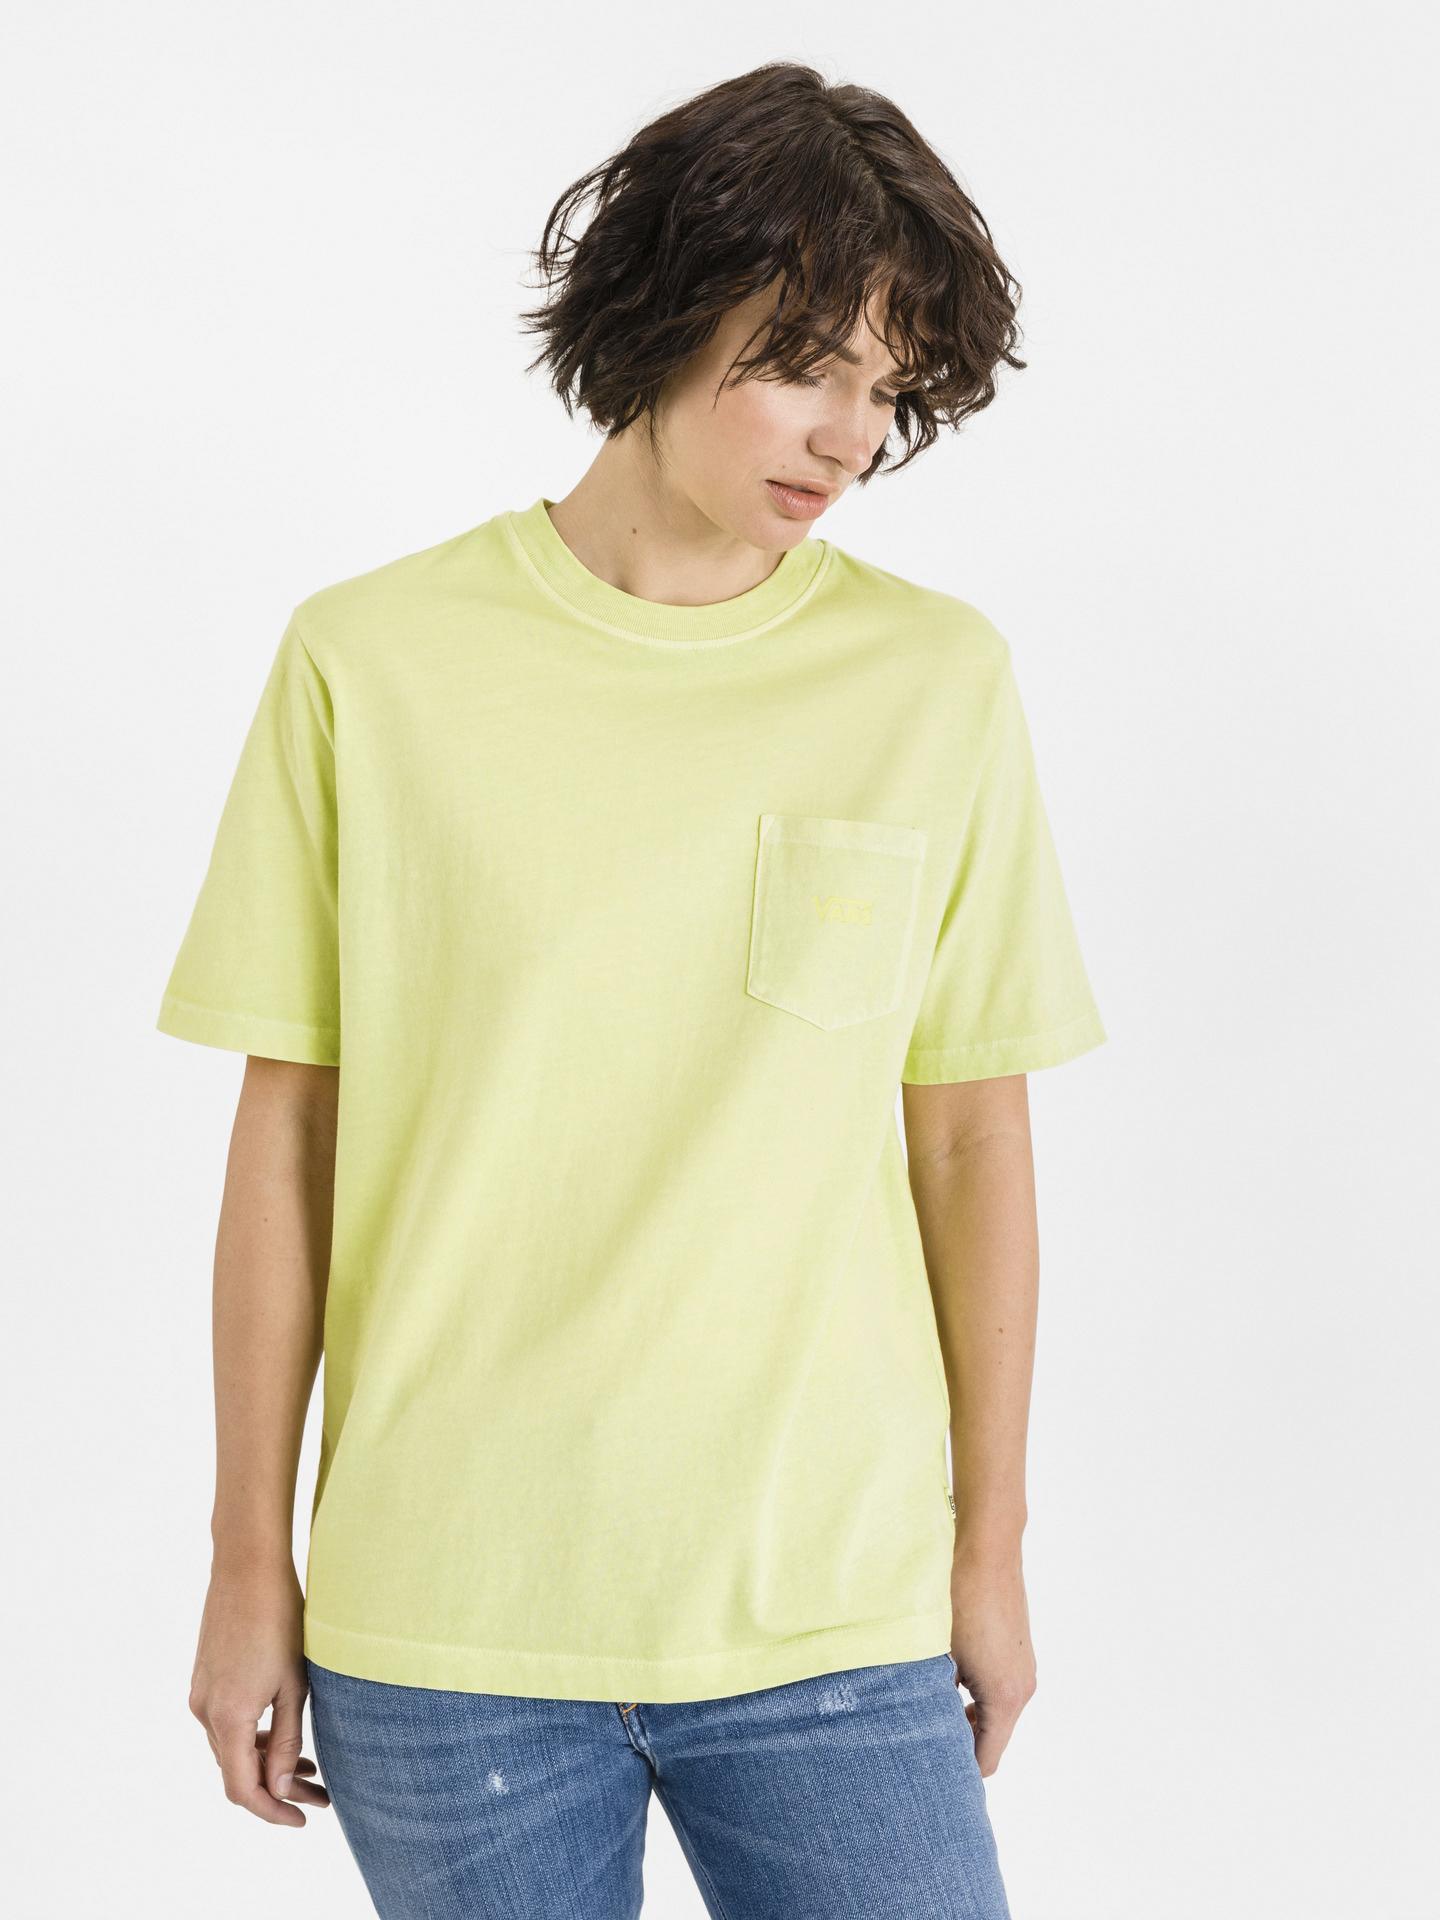 Vans yellow T-shirt Pocket V